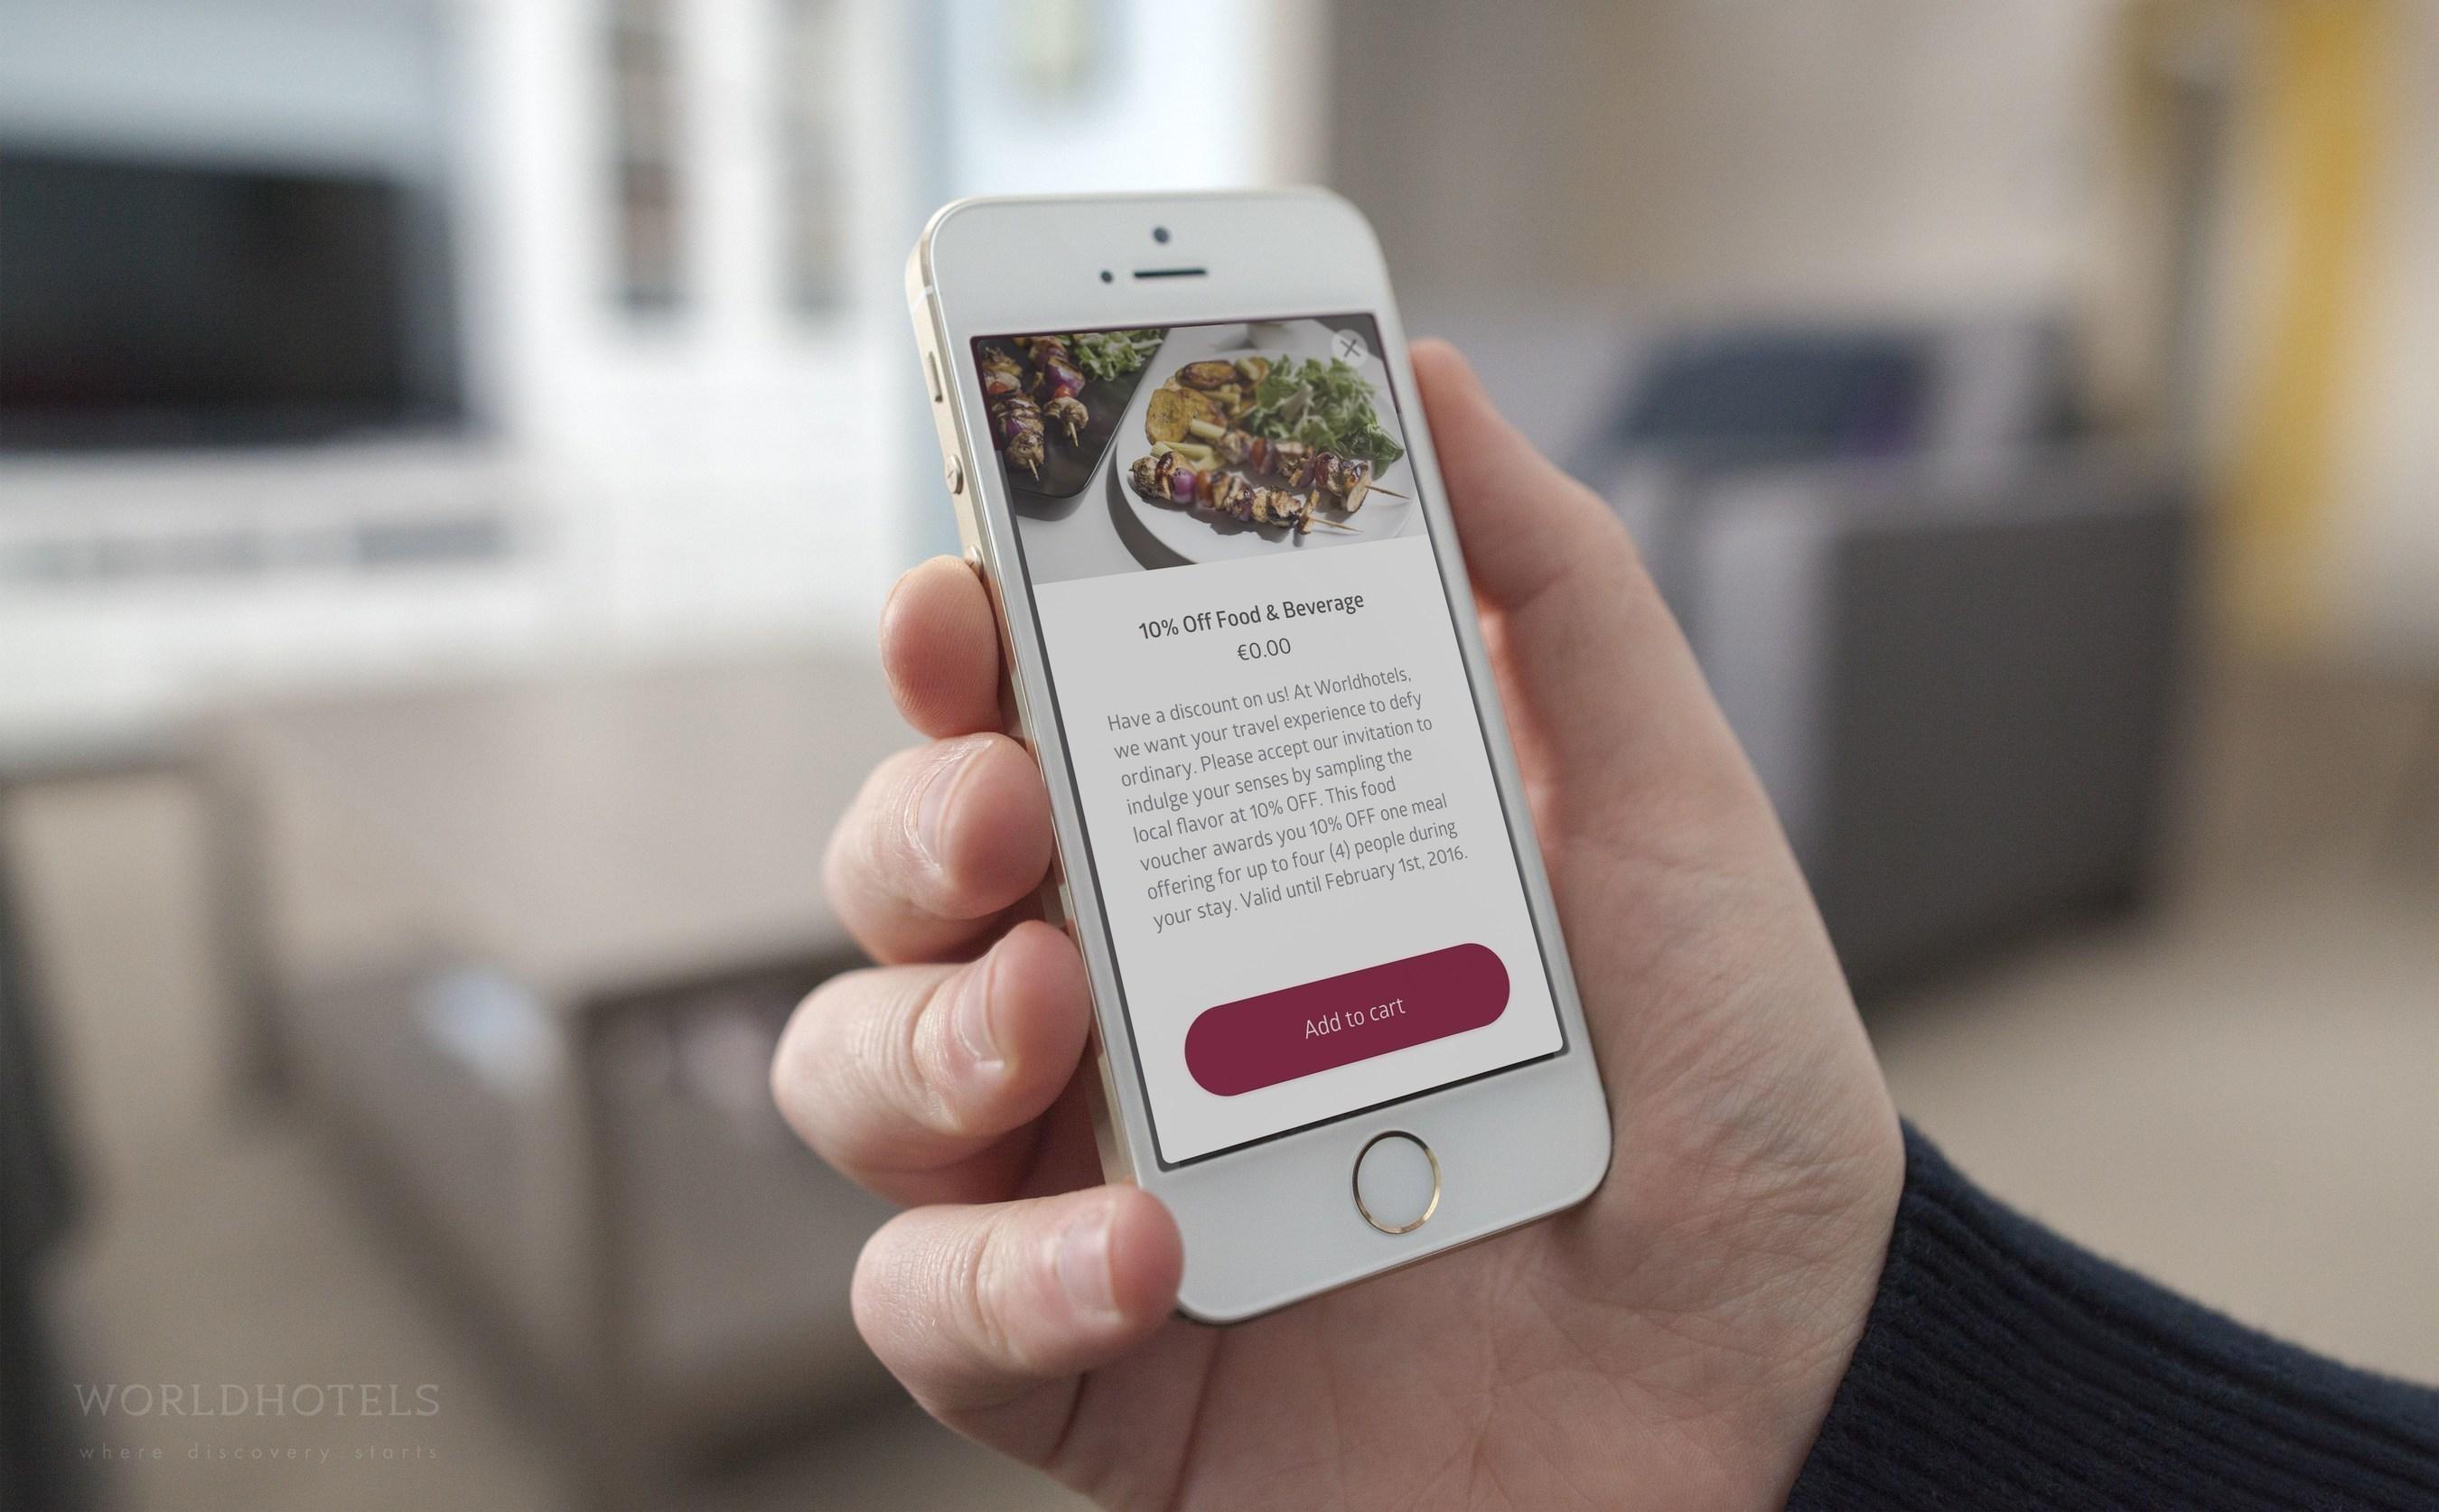 Worldhotels - The next generation of guest engagement with GuestDriven (PRNewsFoto/Worldhotels) (PRNewsFoto/Worldhotels)